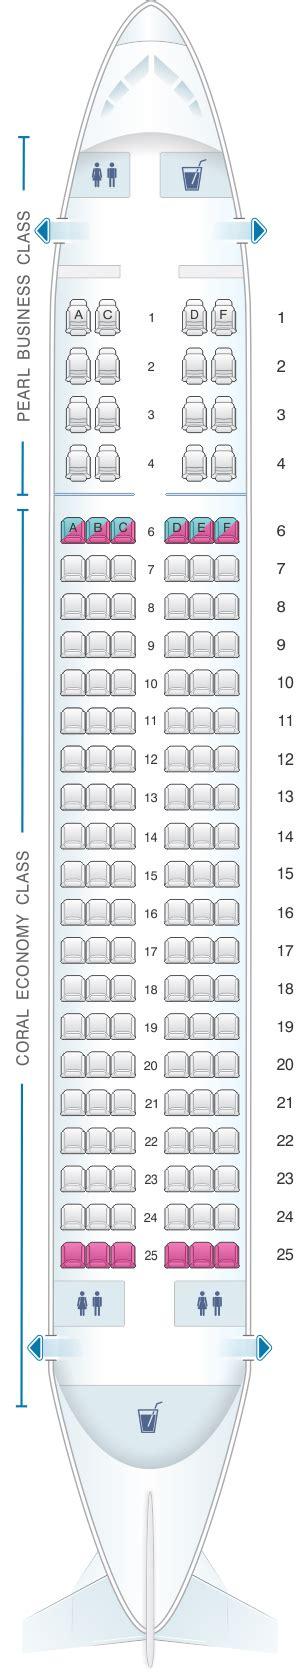 plan des sieges airbus a320 plan de cabine etihad airways airbus a320 200 seatmaestro fr